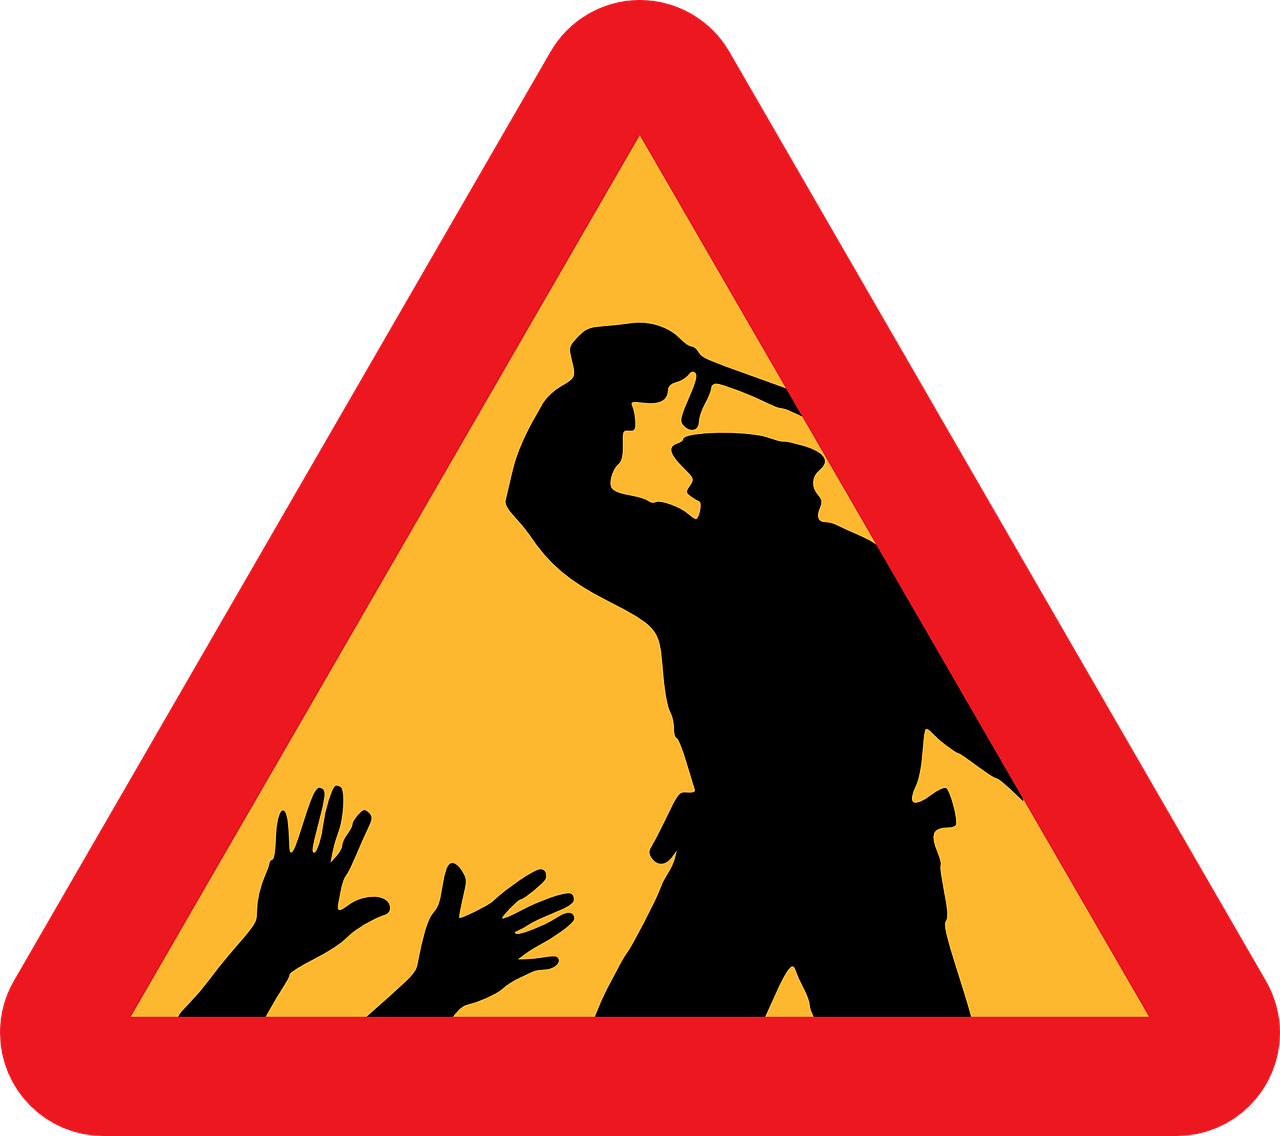 Police Brutality Warning PNG.